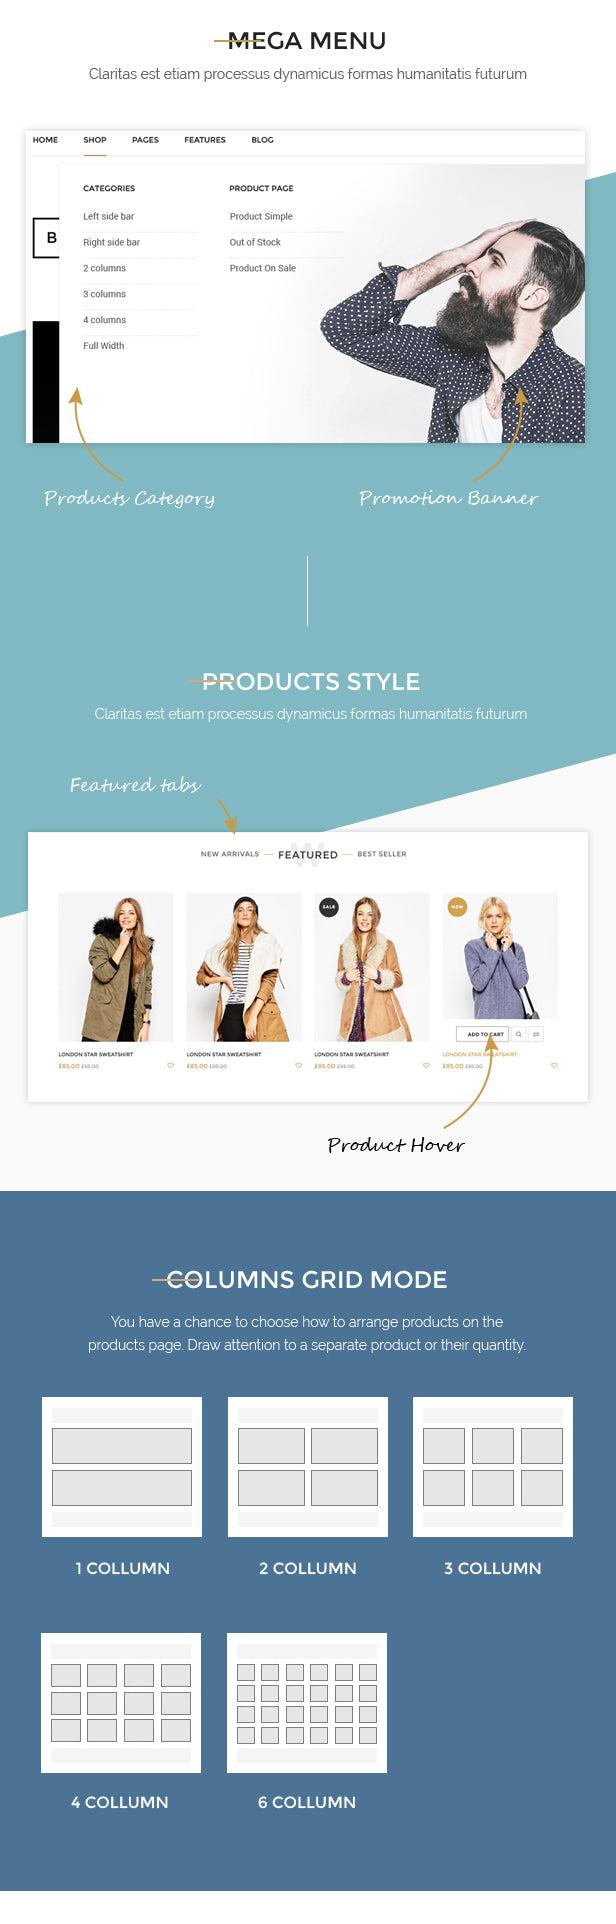 Boutique - Responsive Shopify Theme - 14